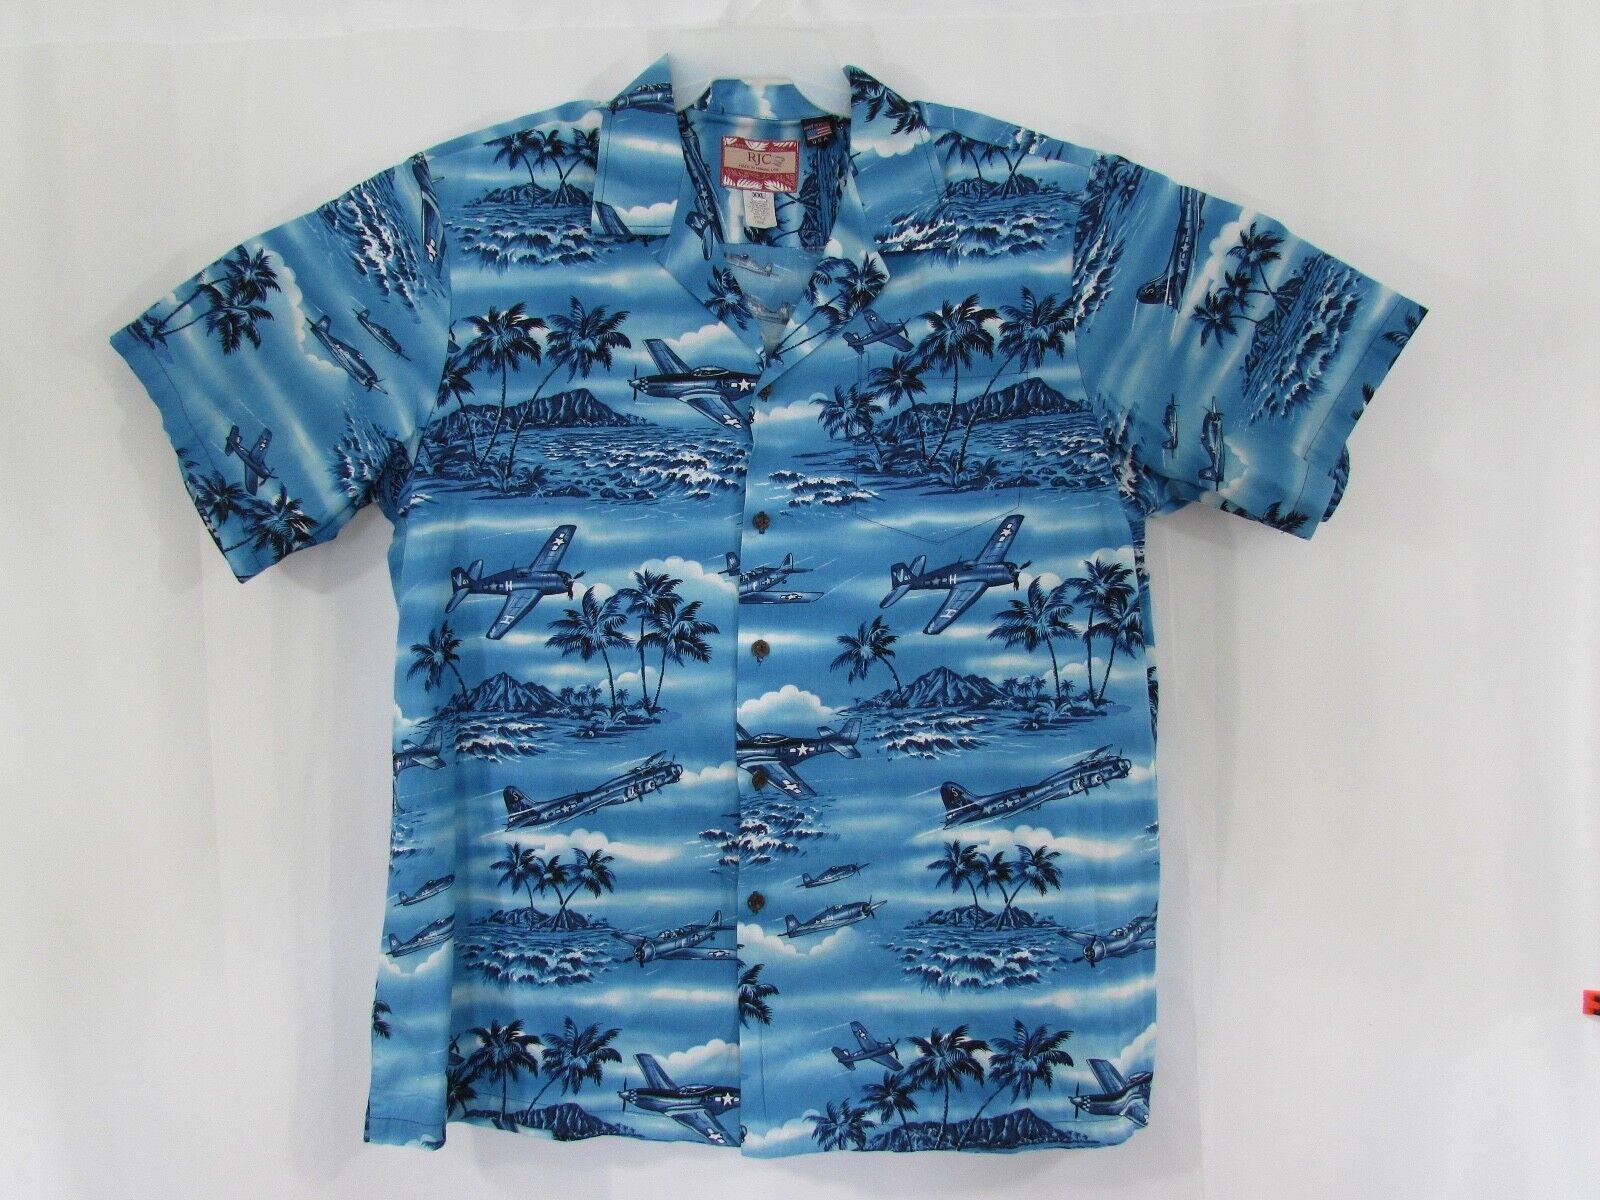 RJC Hawaiian Shirt bluee Vintage WW2 fighters bombers planes 2XL Made in Hawaii